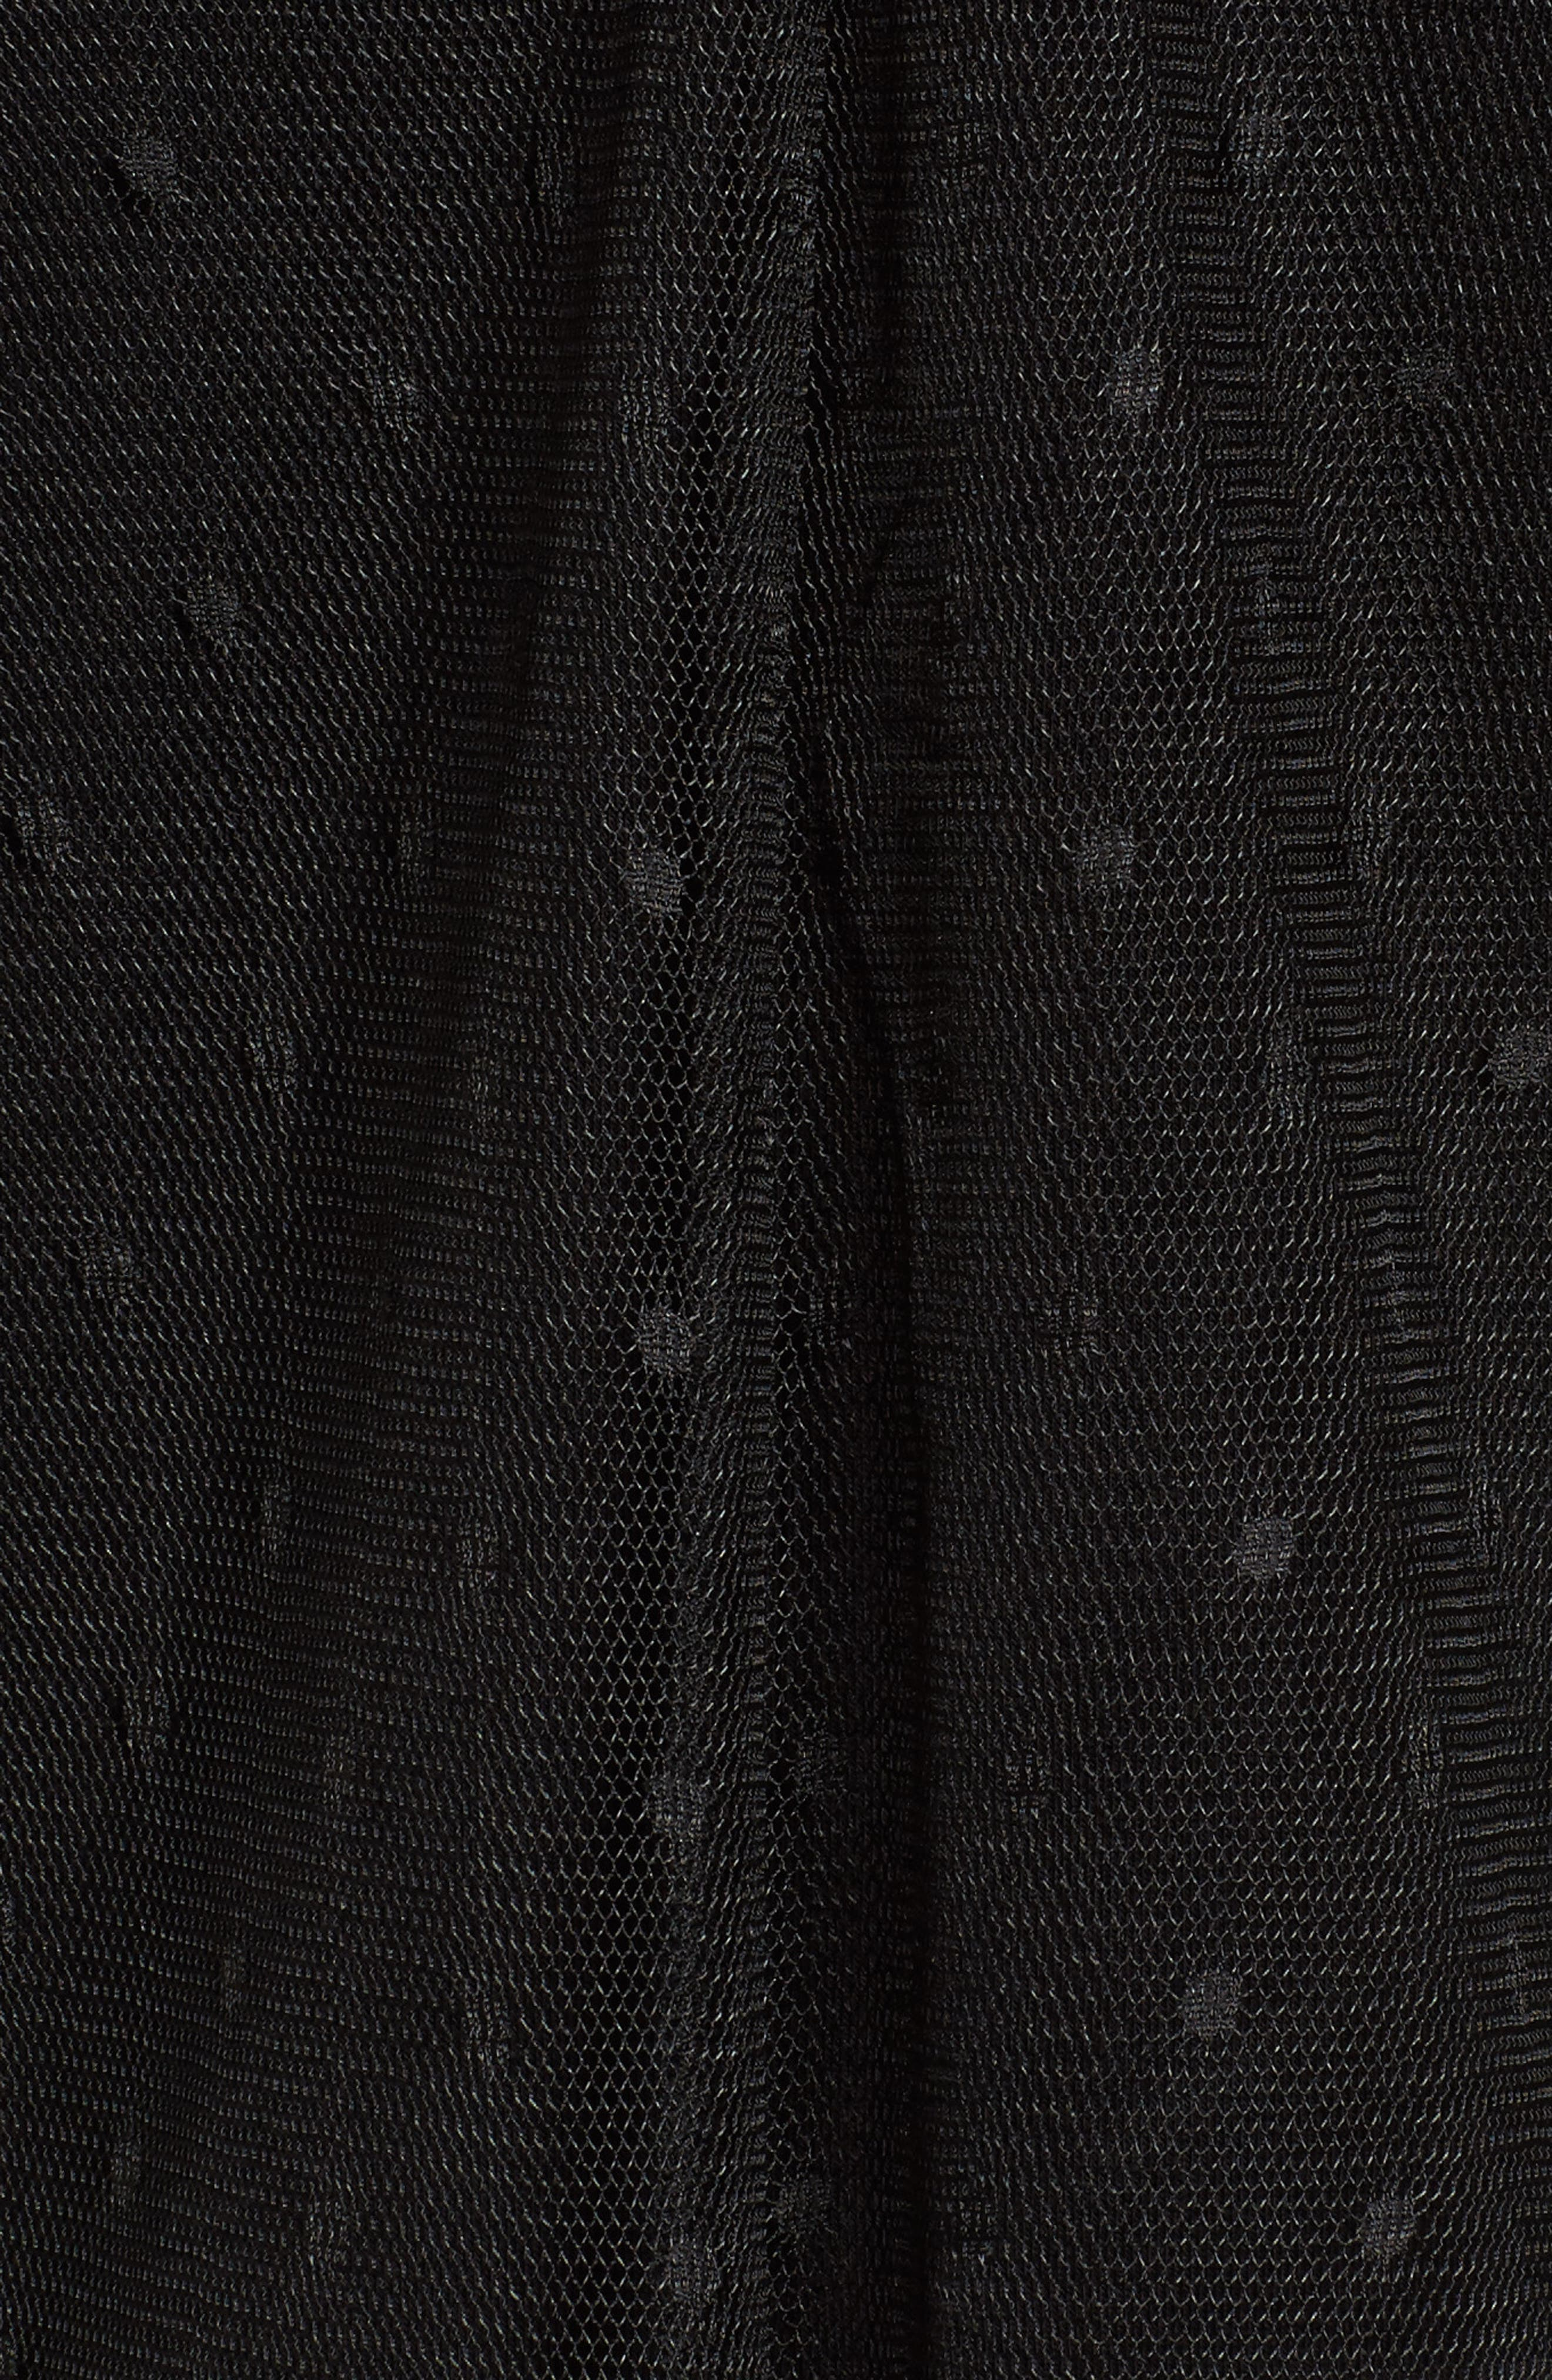 Ruffle Sleeve Mesh Top,                             Alternate thumbnail 5, color,                             001